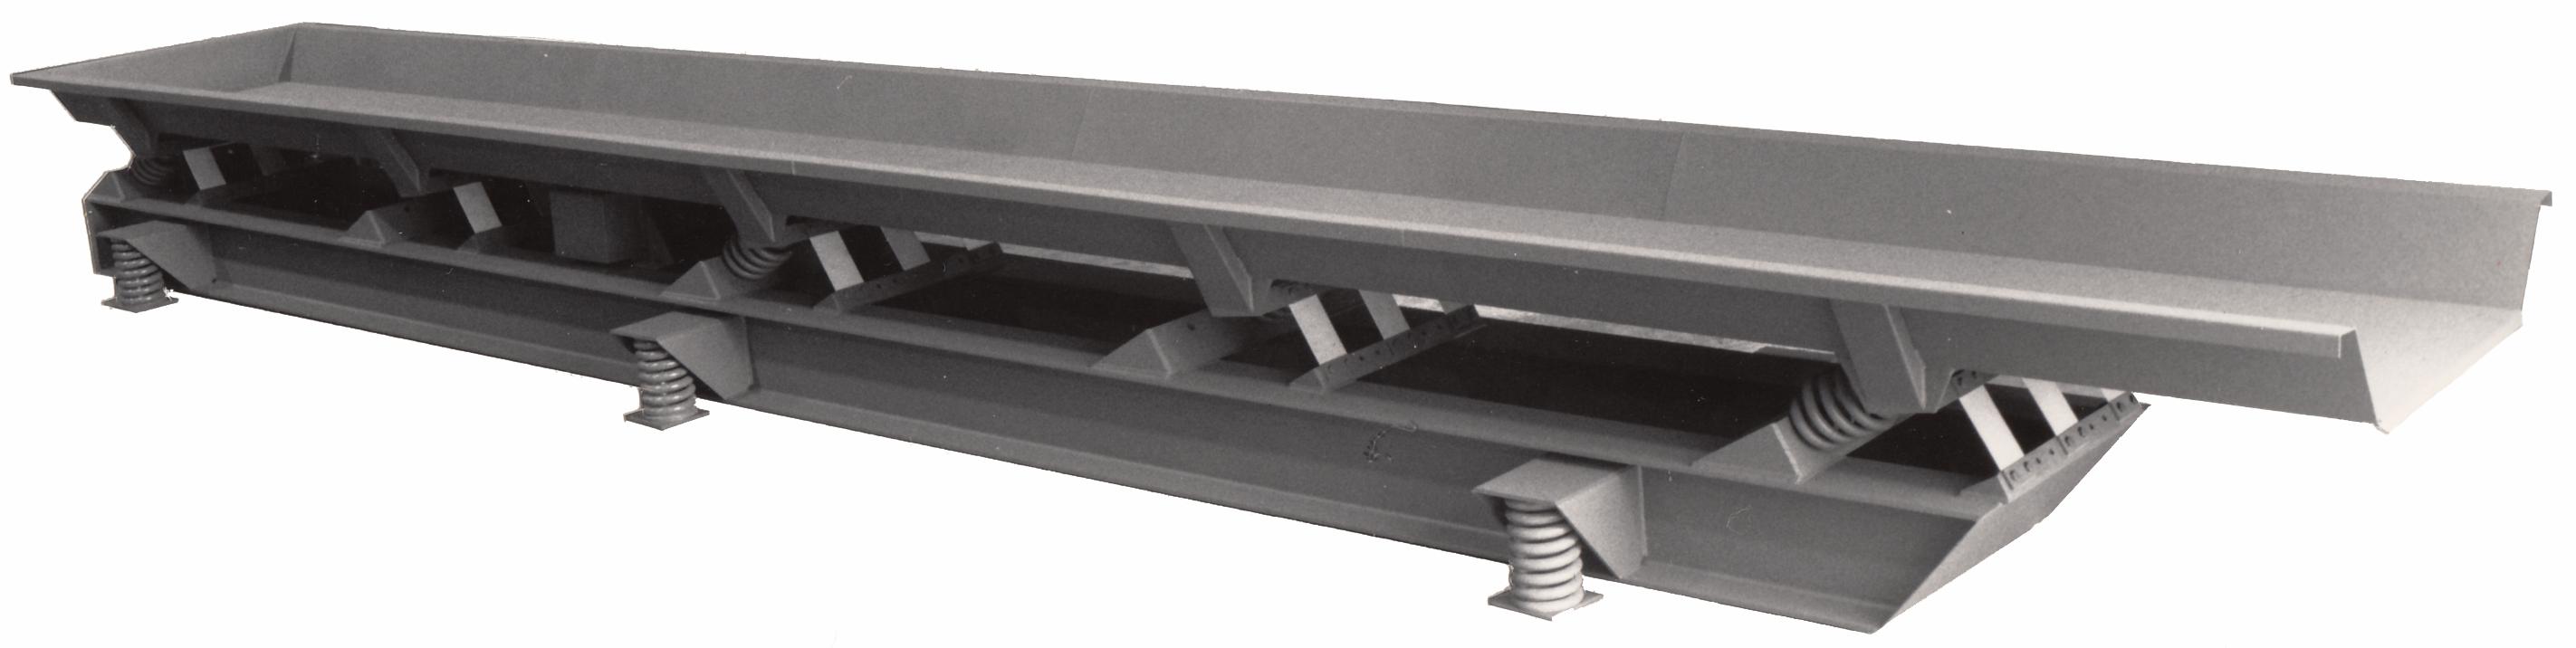 Conveyor Photo 10